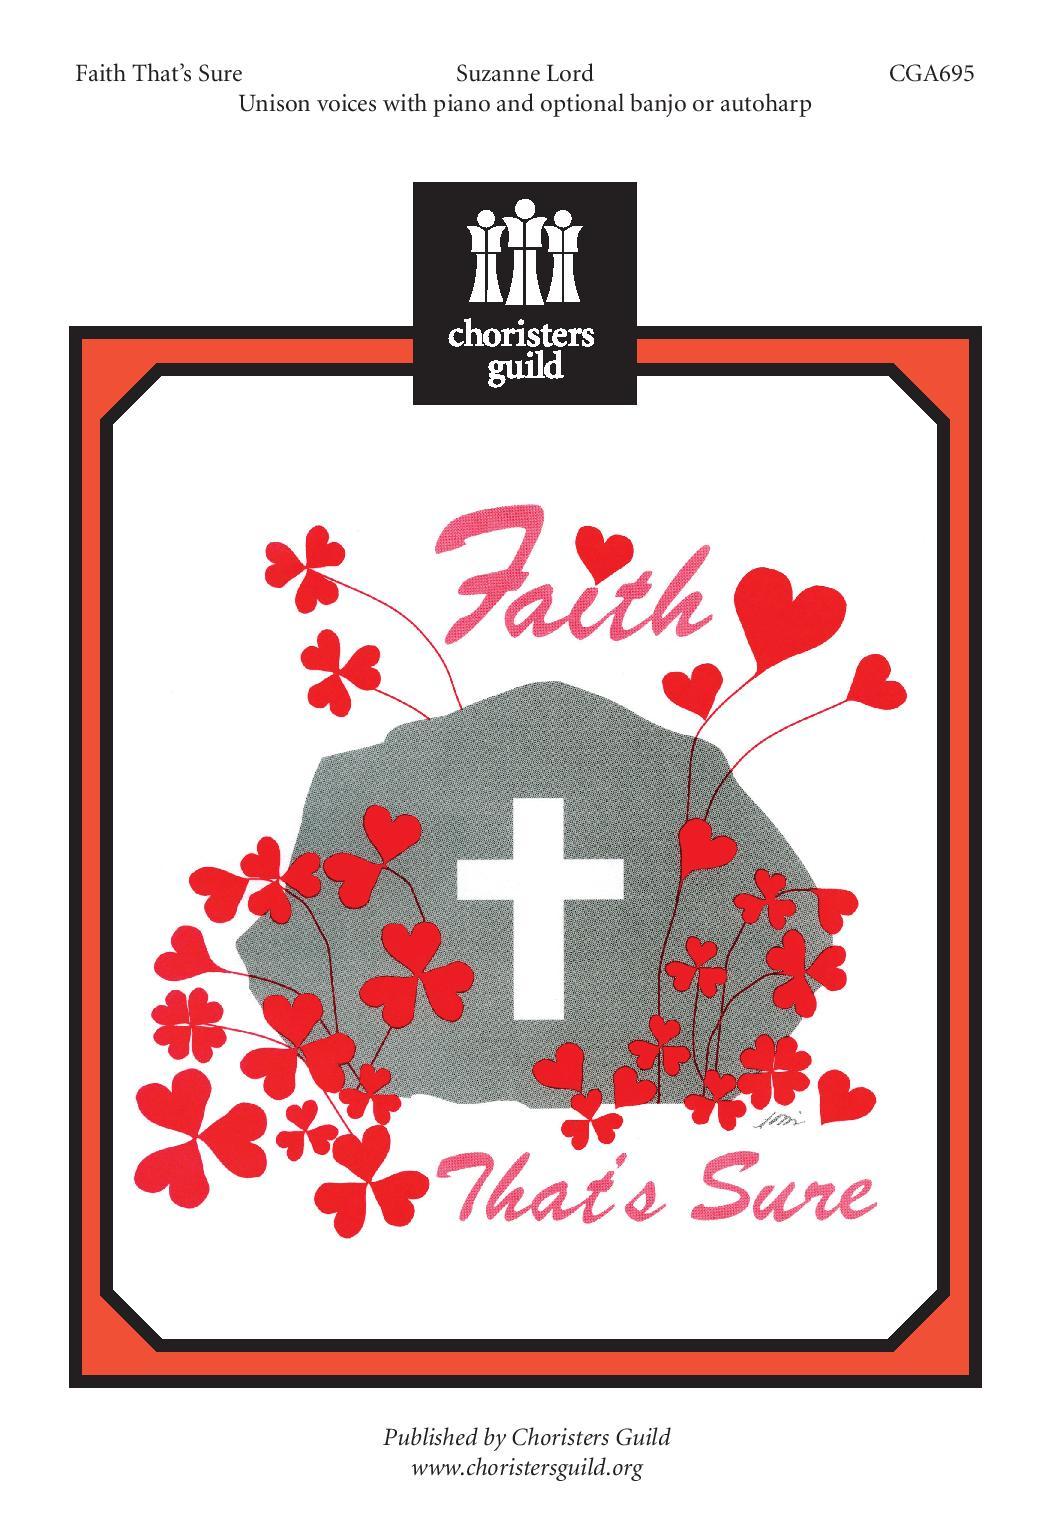 Faith That's Sure